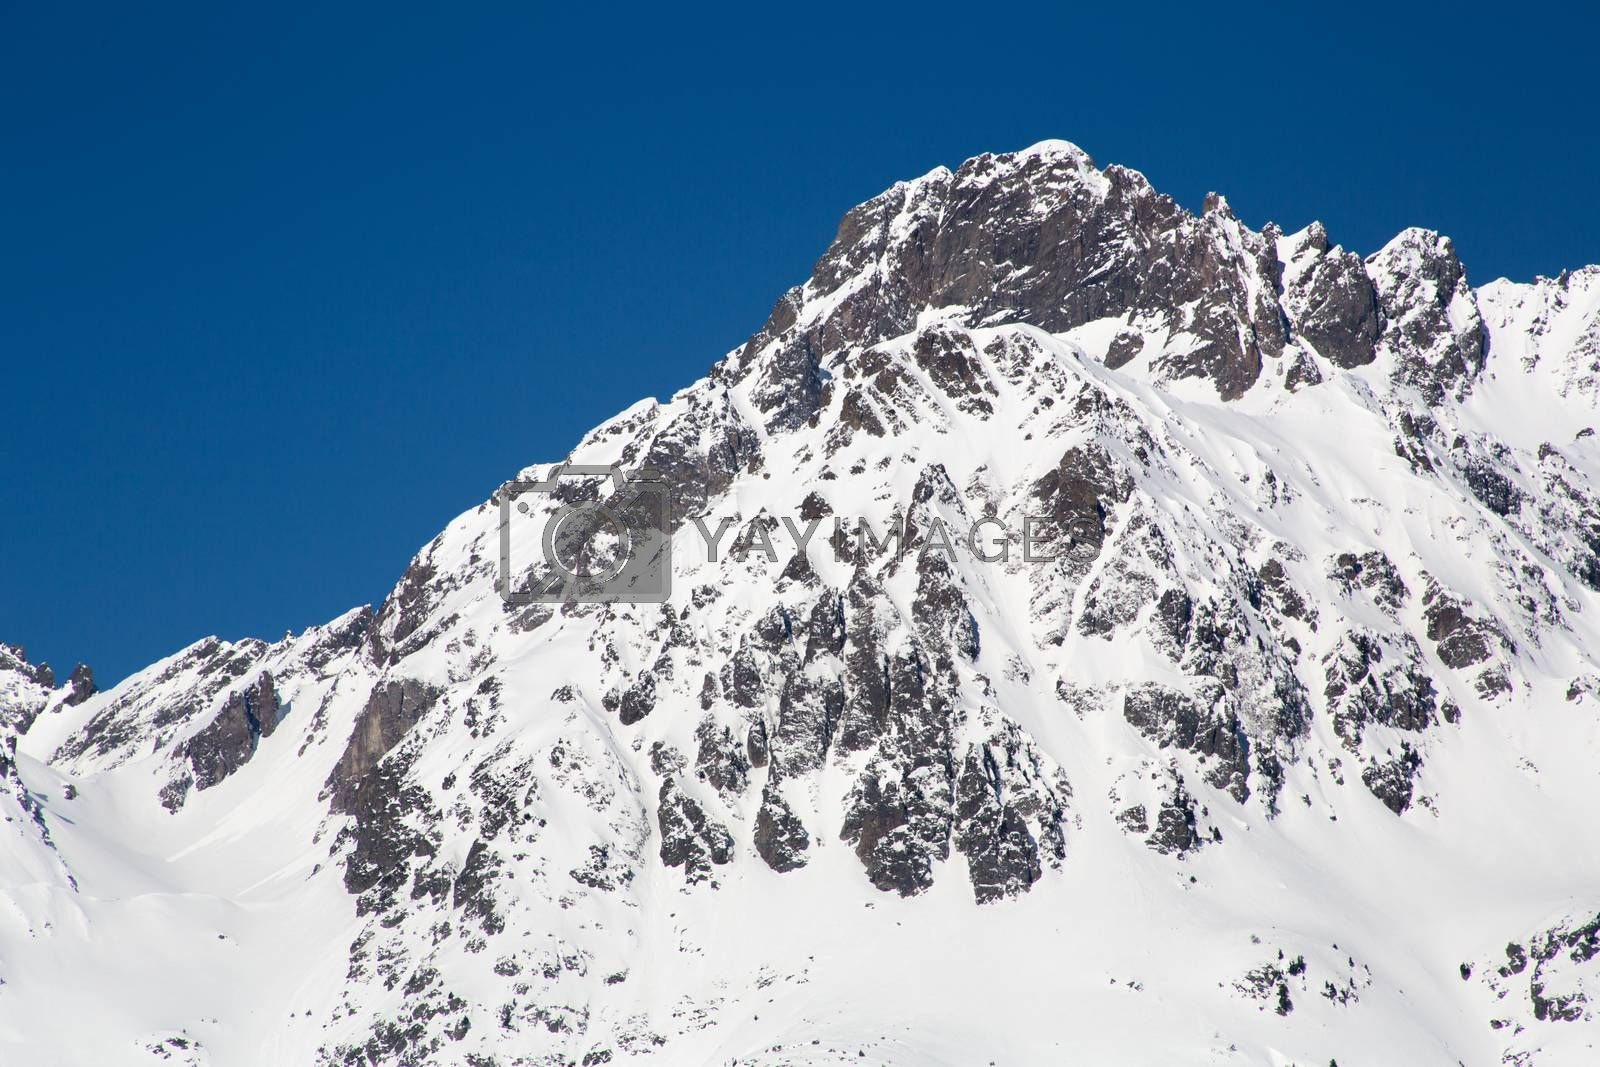 Alps in winter - 14 by Kartouchken